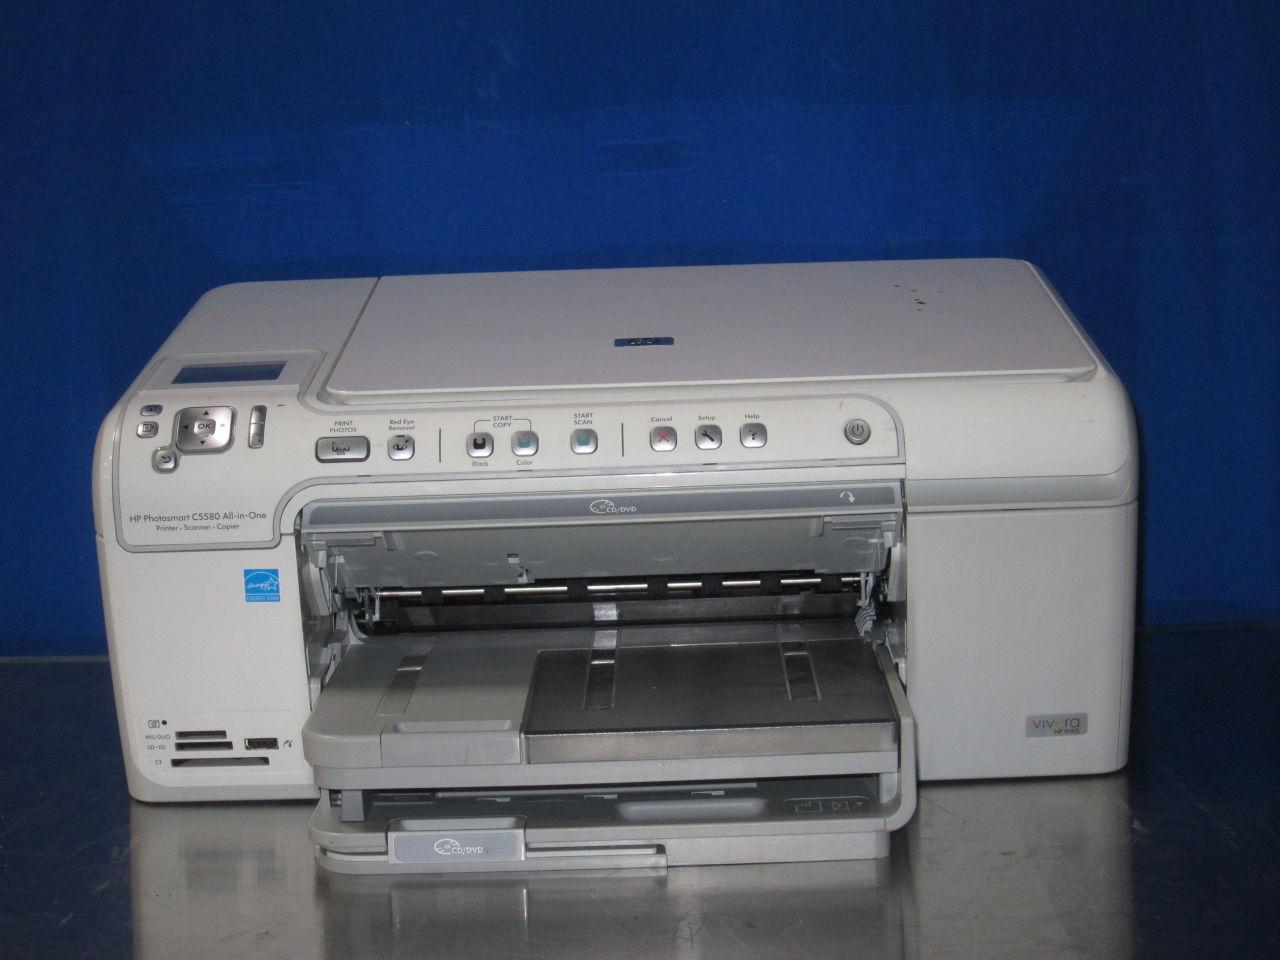 HP Photosmart C5580 Printer